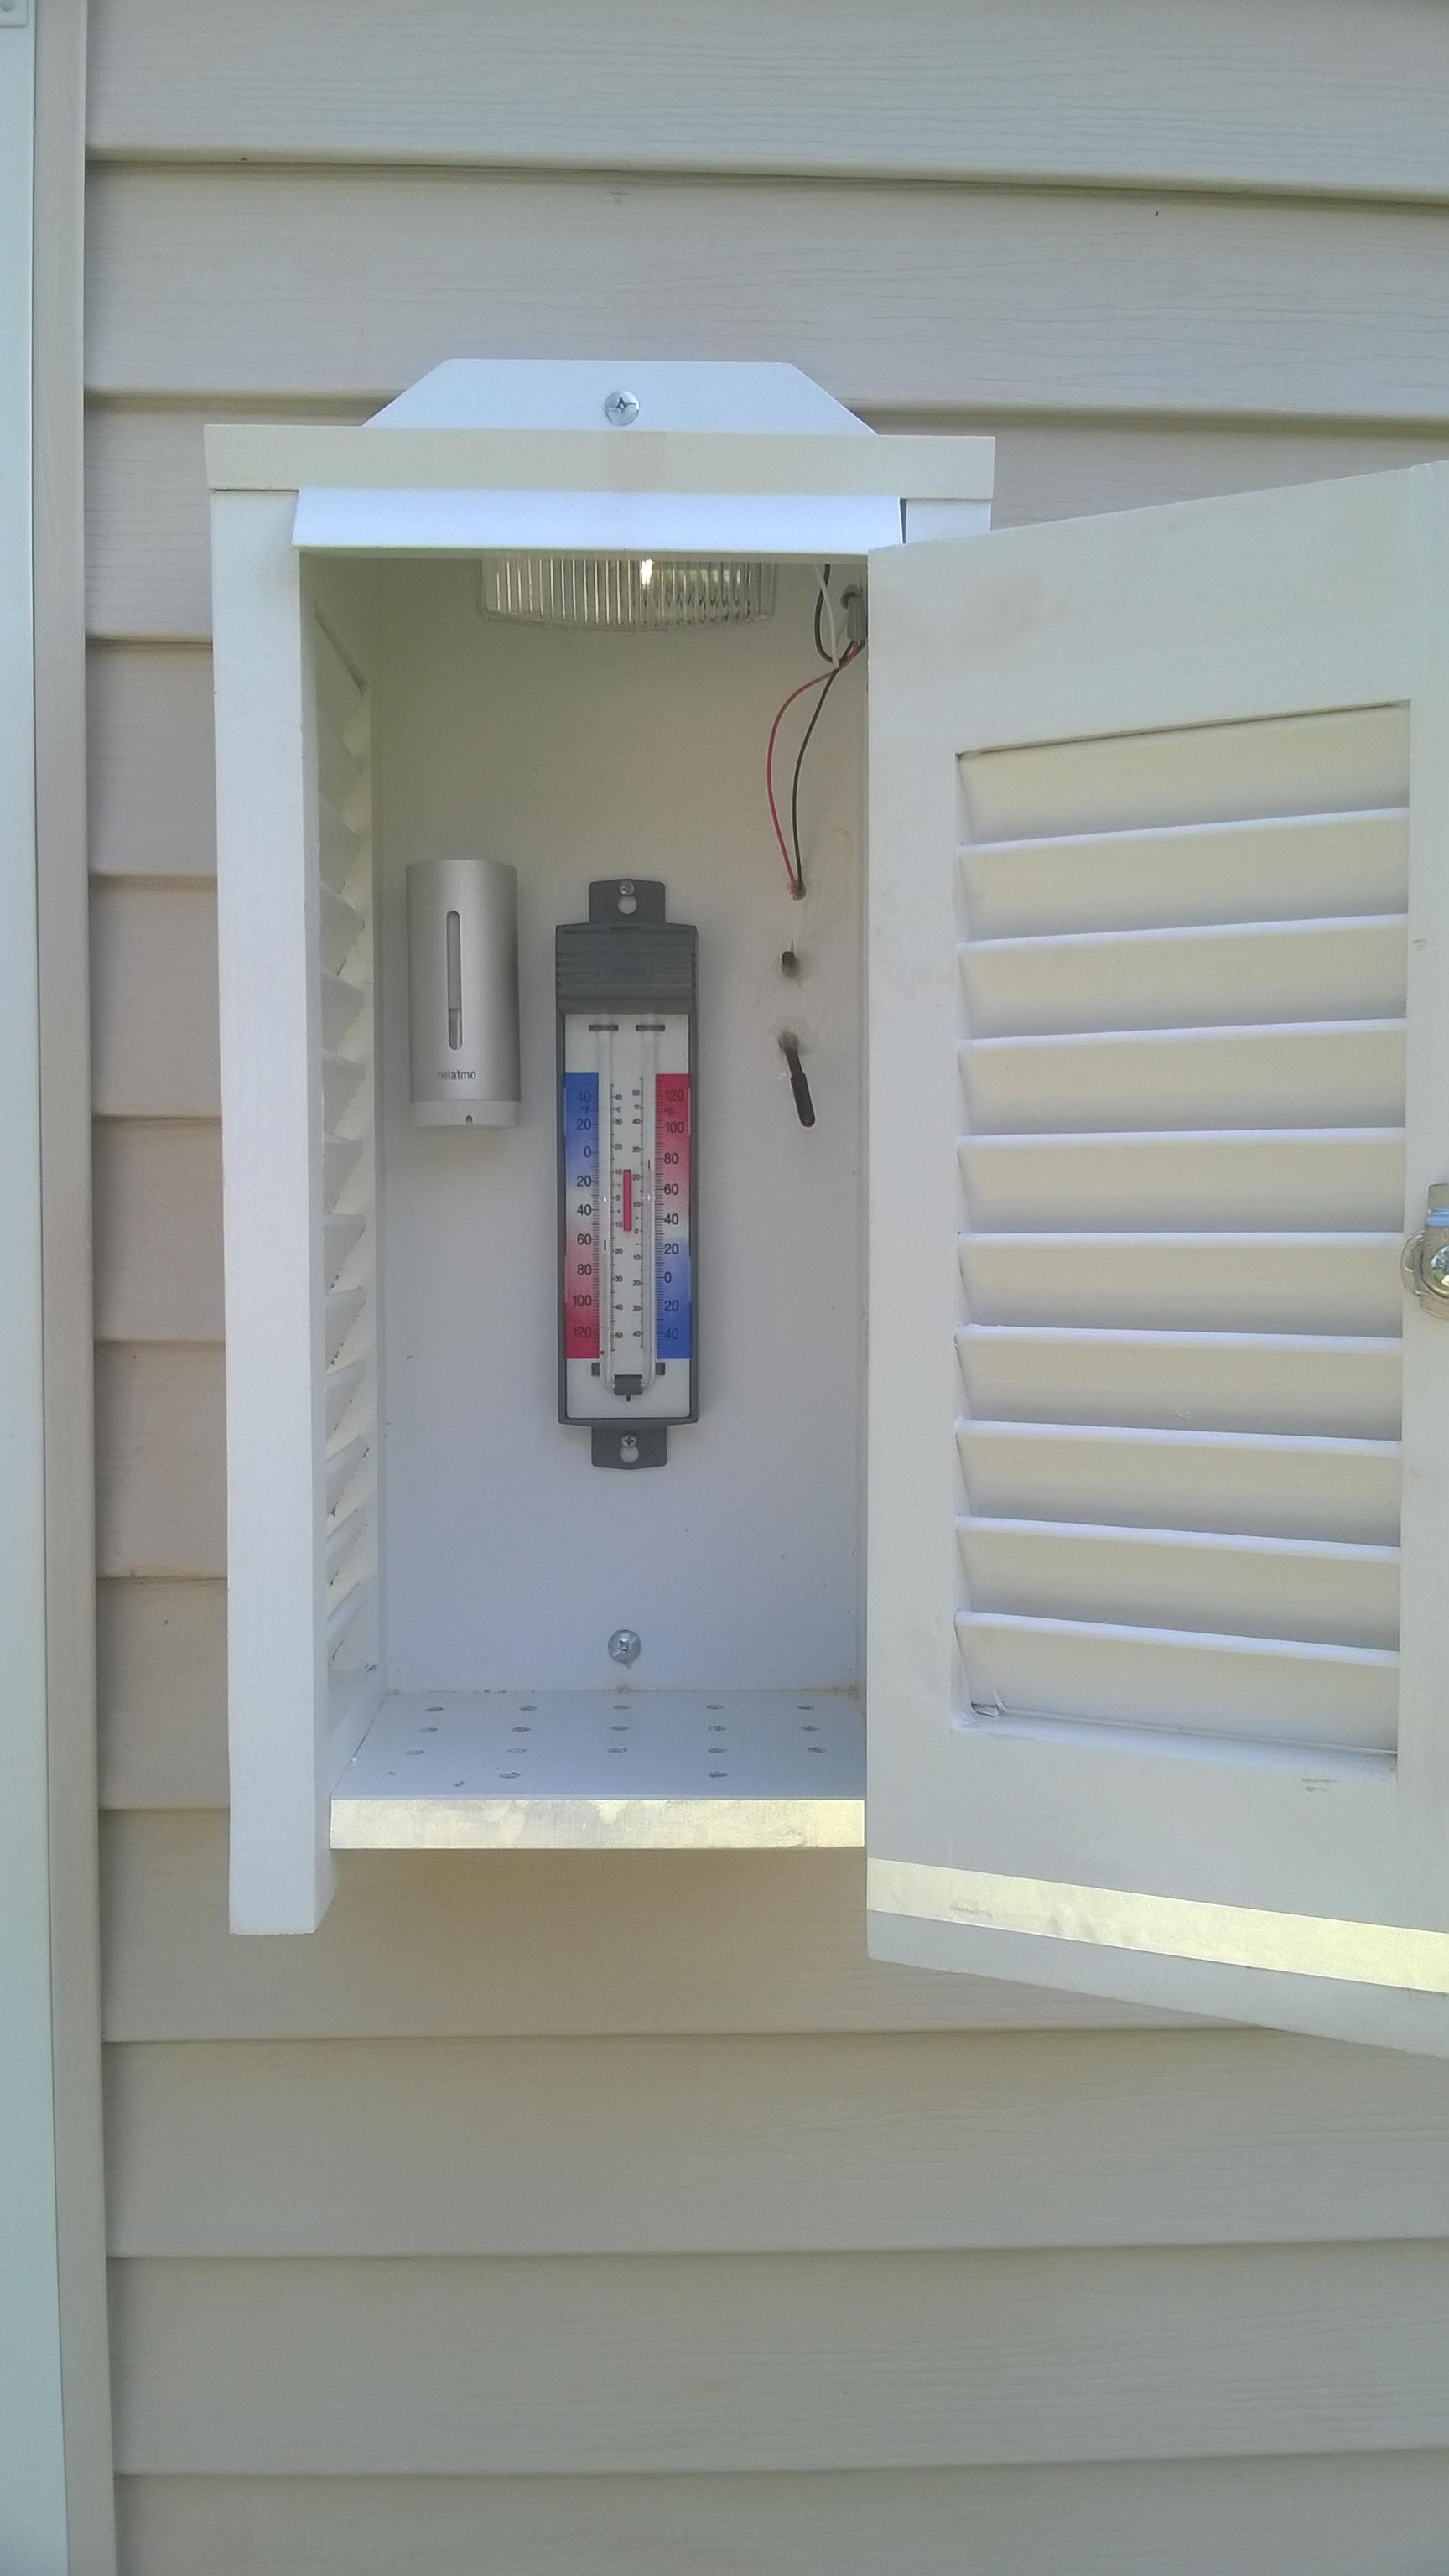 NovaLynx Model 380600 Thermometer Shelter Pics